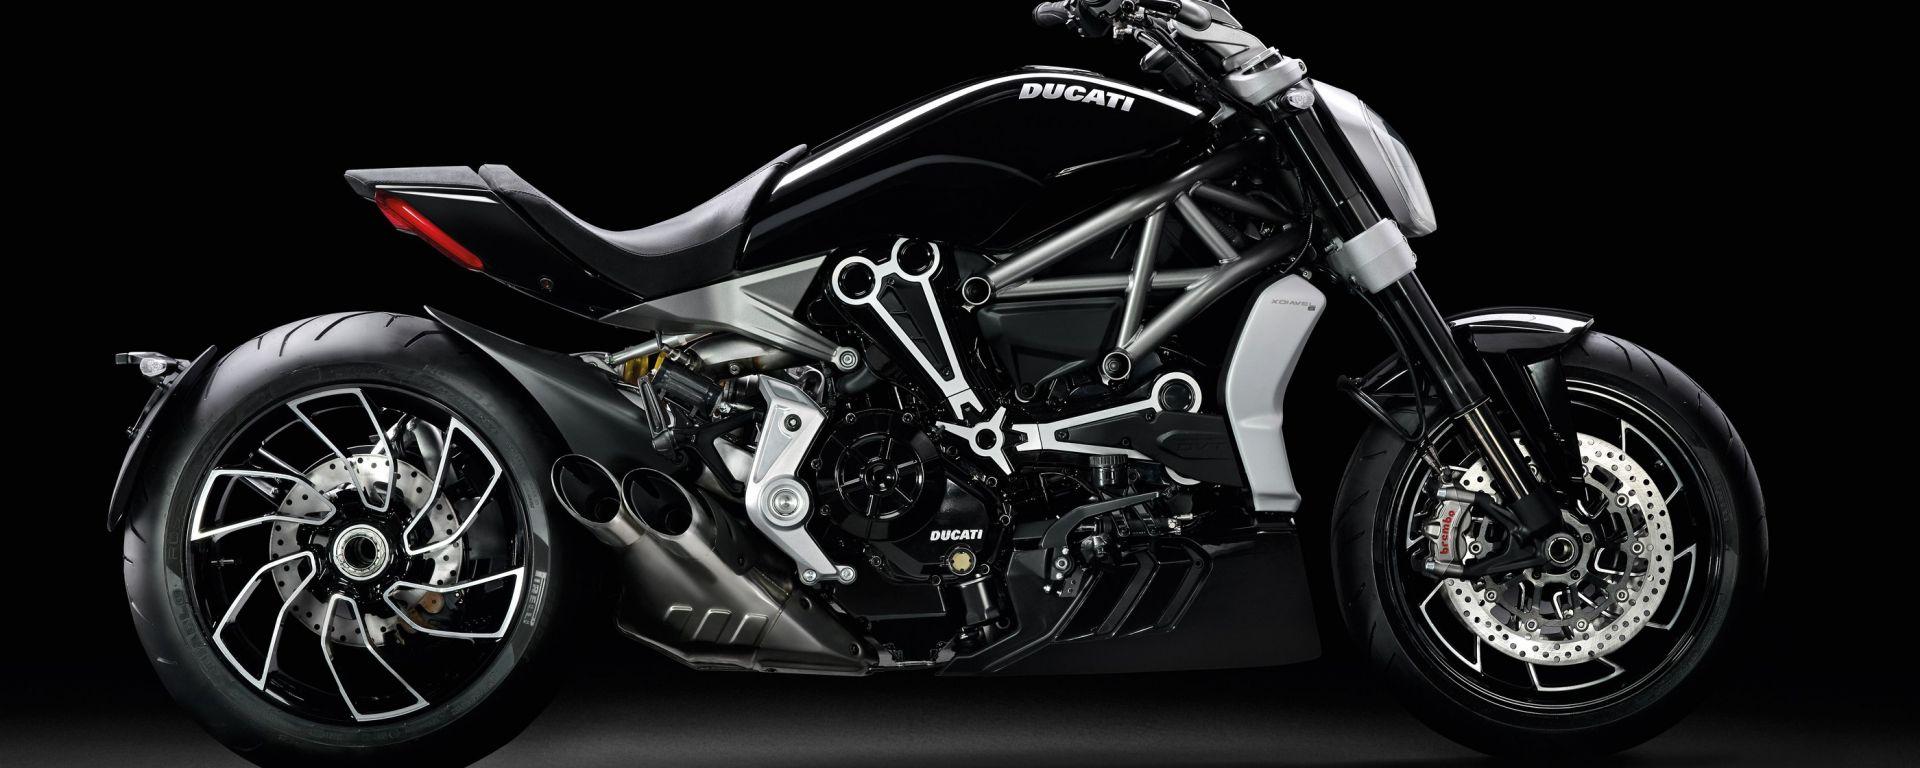 Novità moto: Ducati XDiavel - MotorBox